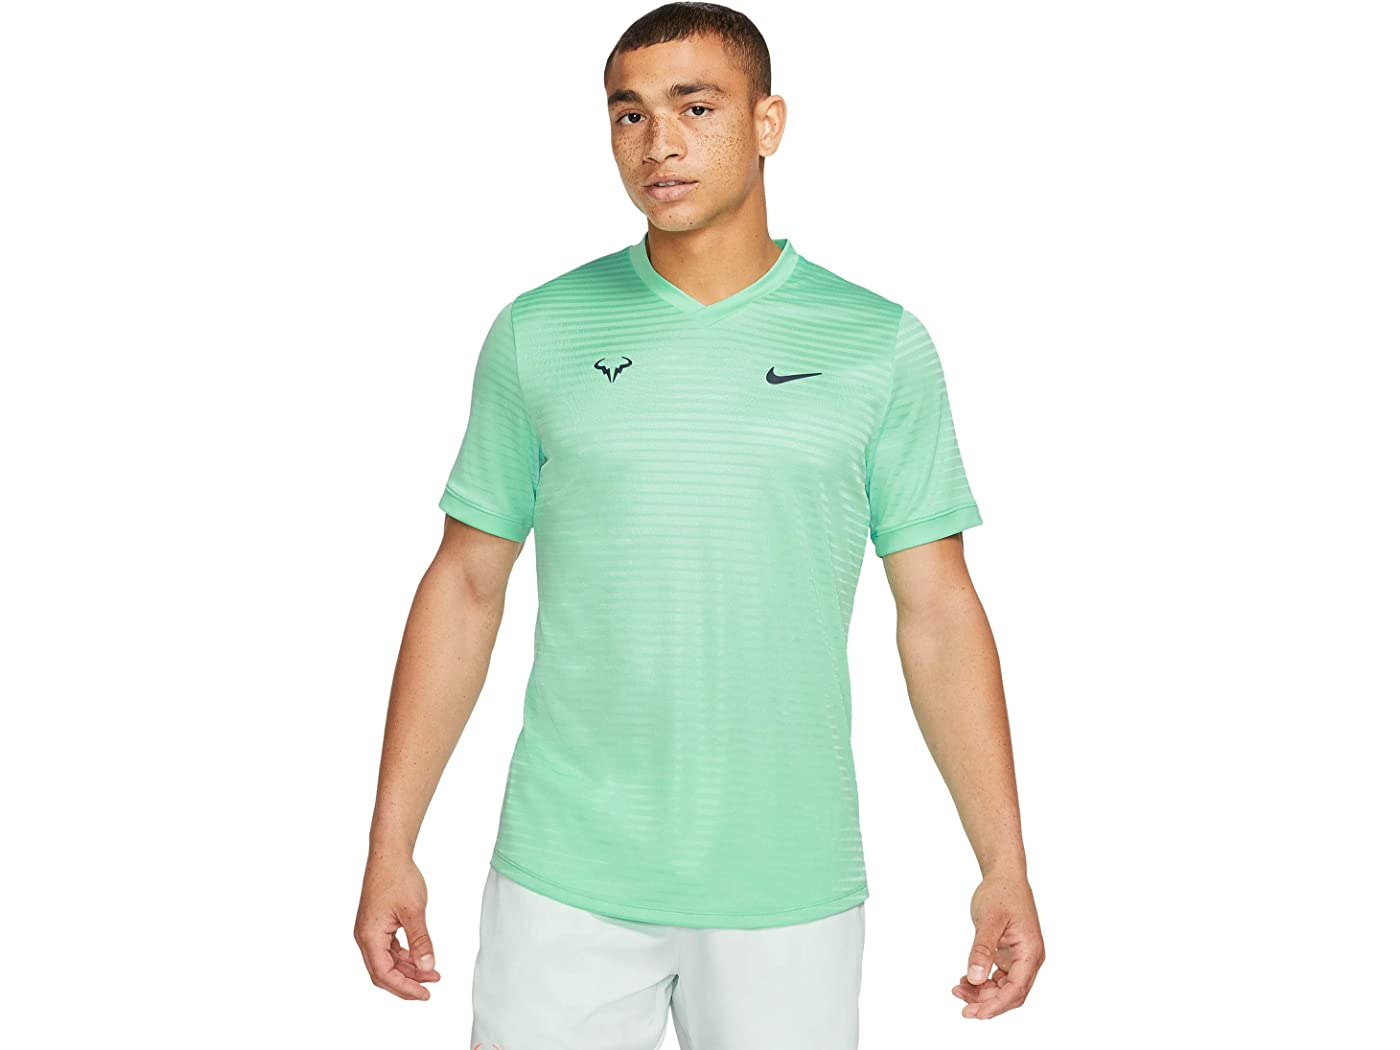 Rafa NikeCourt Challenger Top Short Sleeve